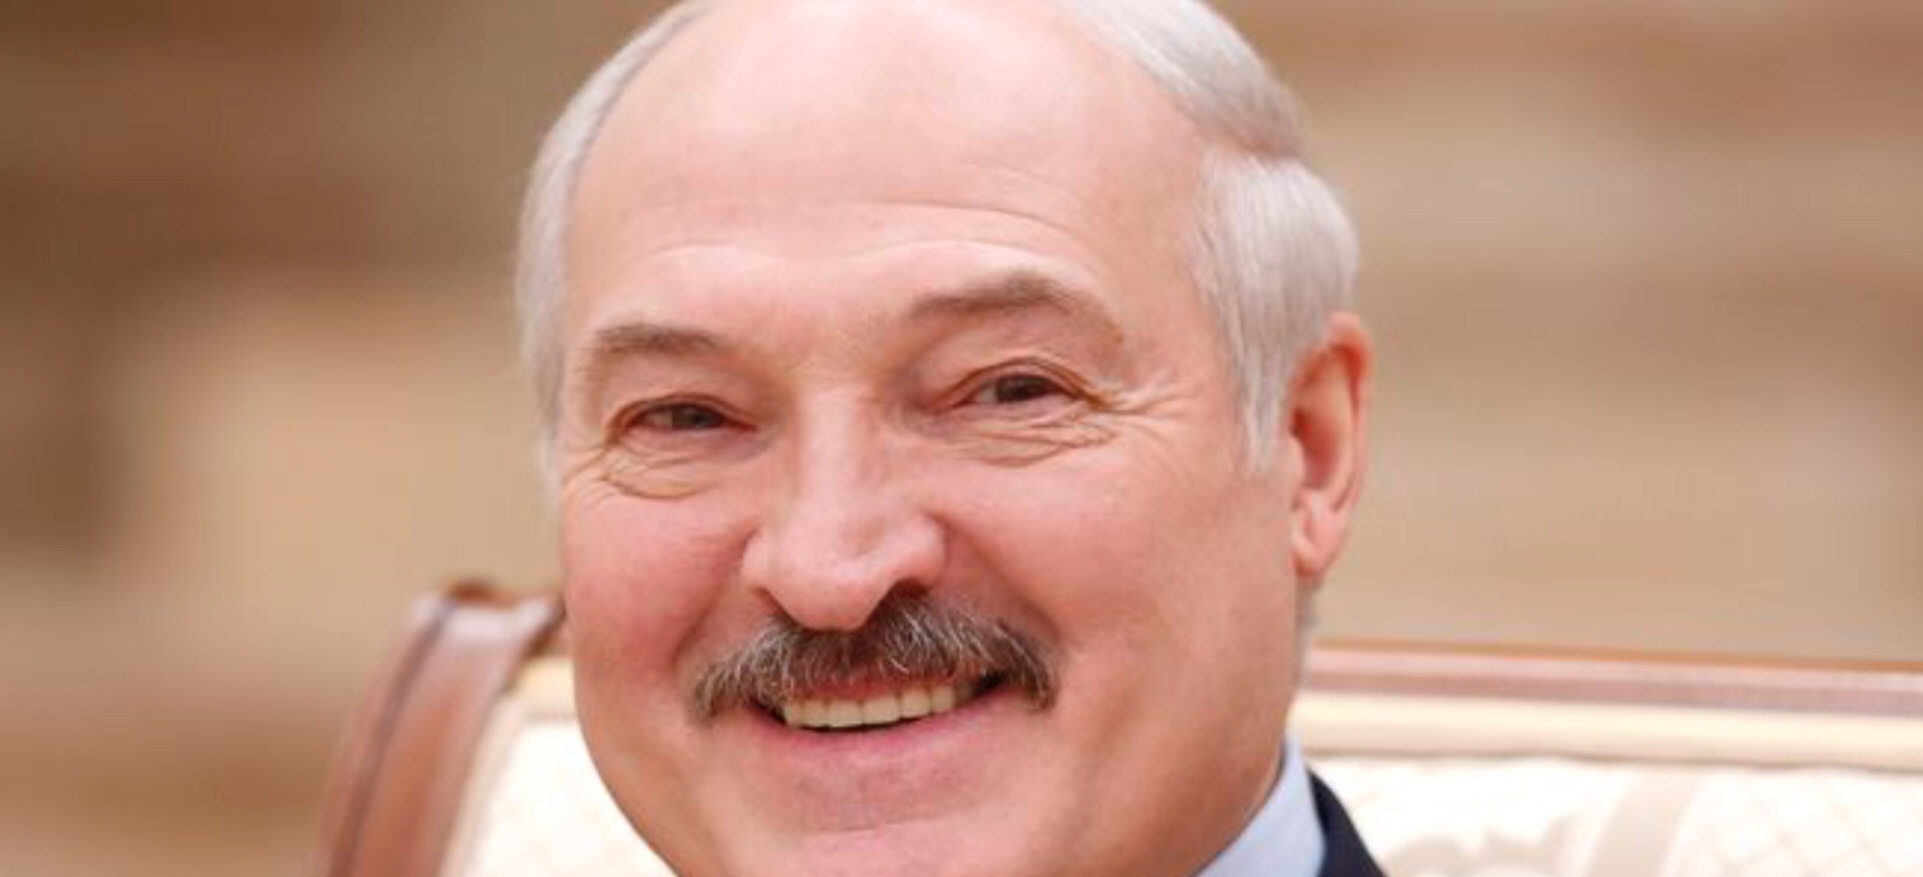 Belarus: Lukashenko announced 80% eleciton winner